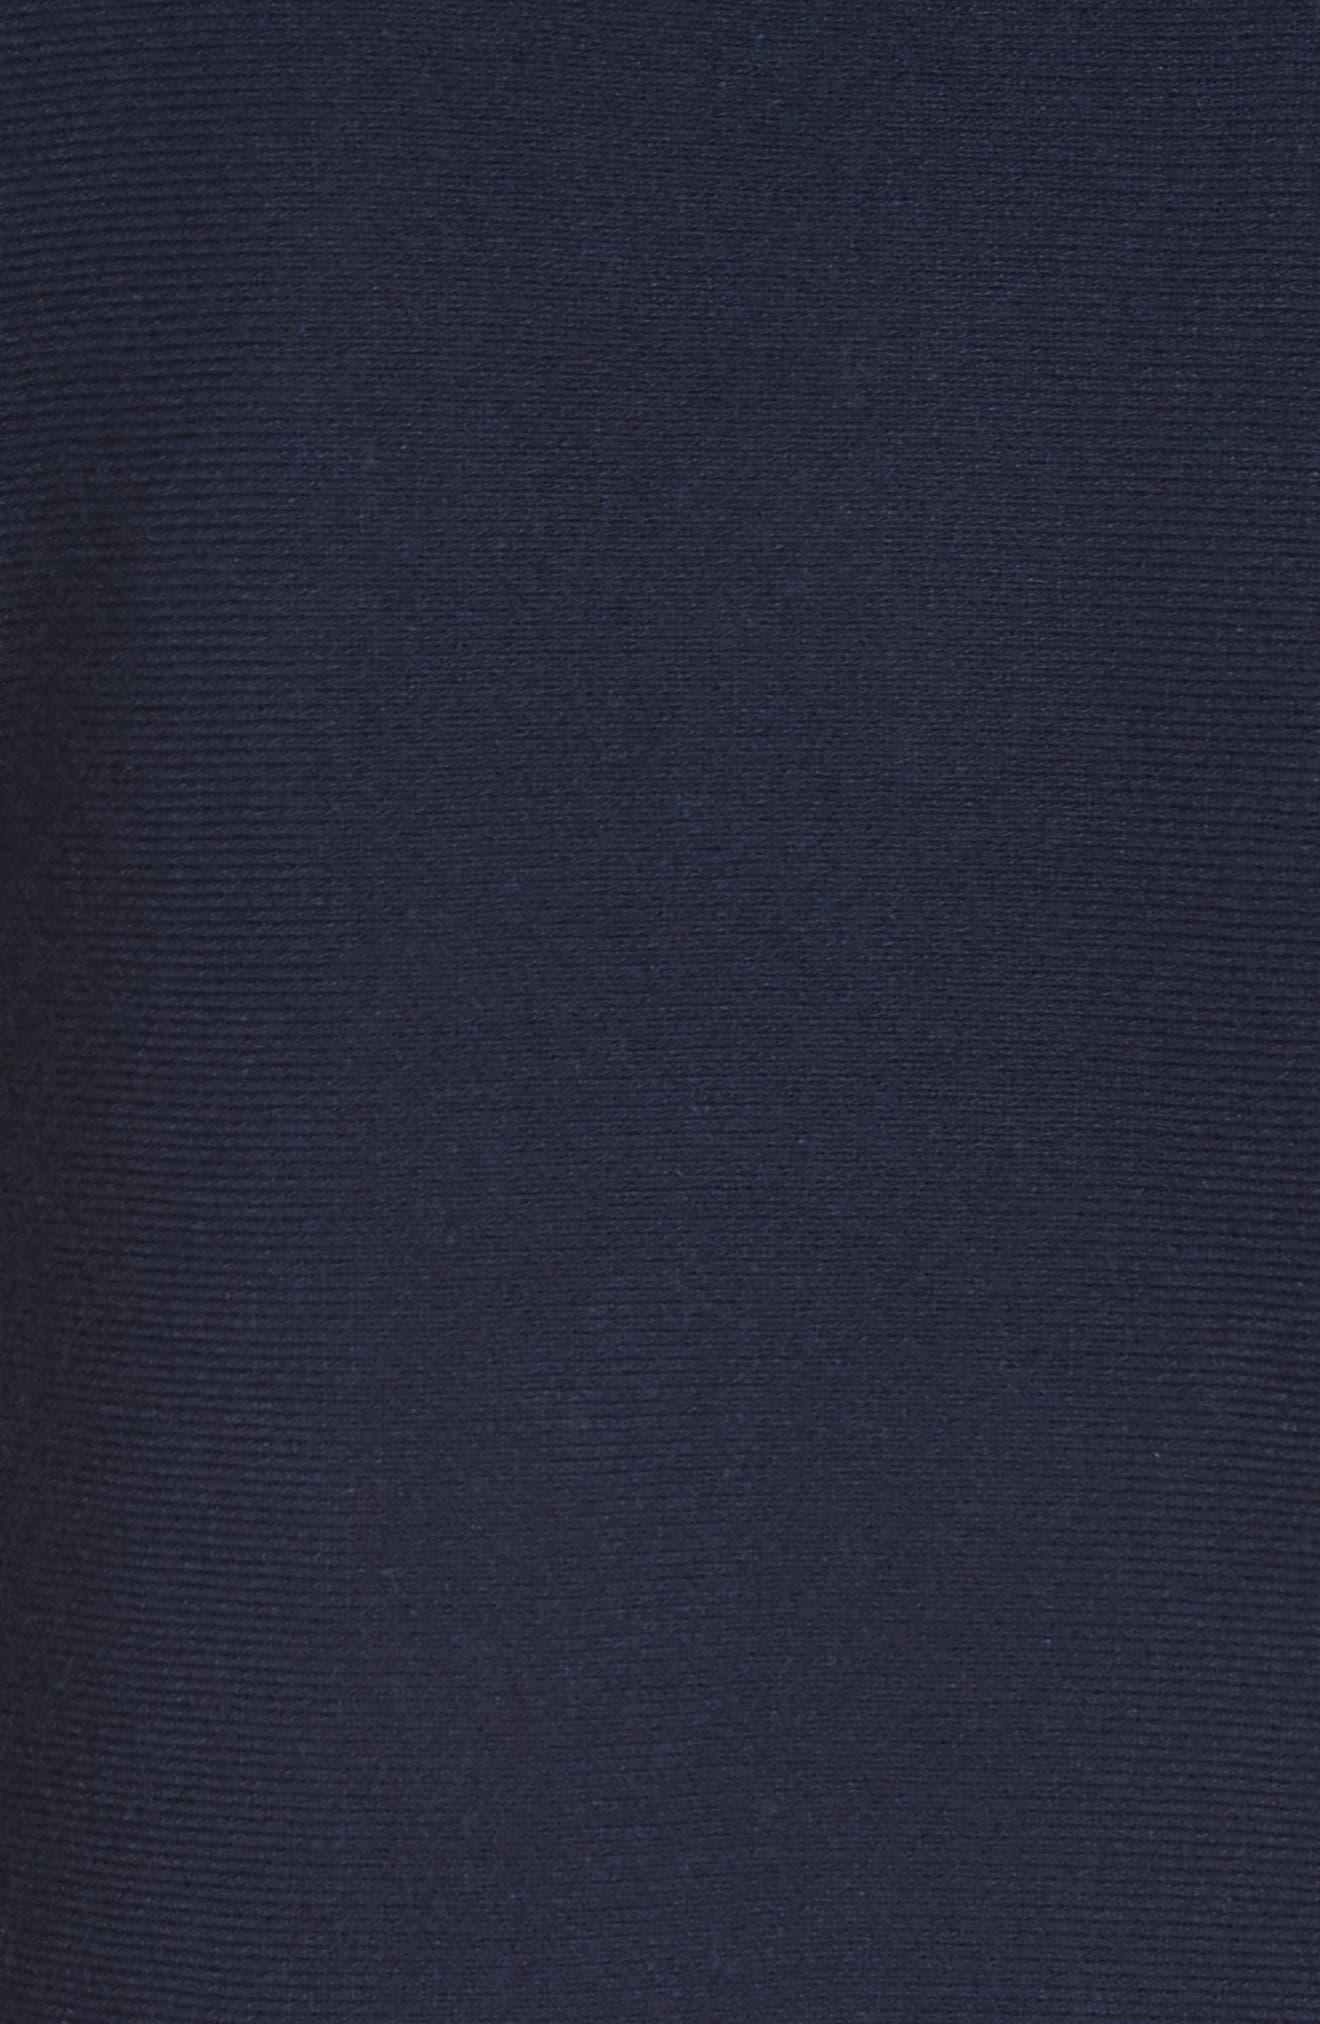 Scallop Hem Shift Dress,                             Alternate thumbnail 5, color,                             410